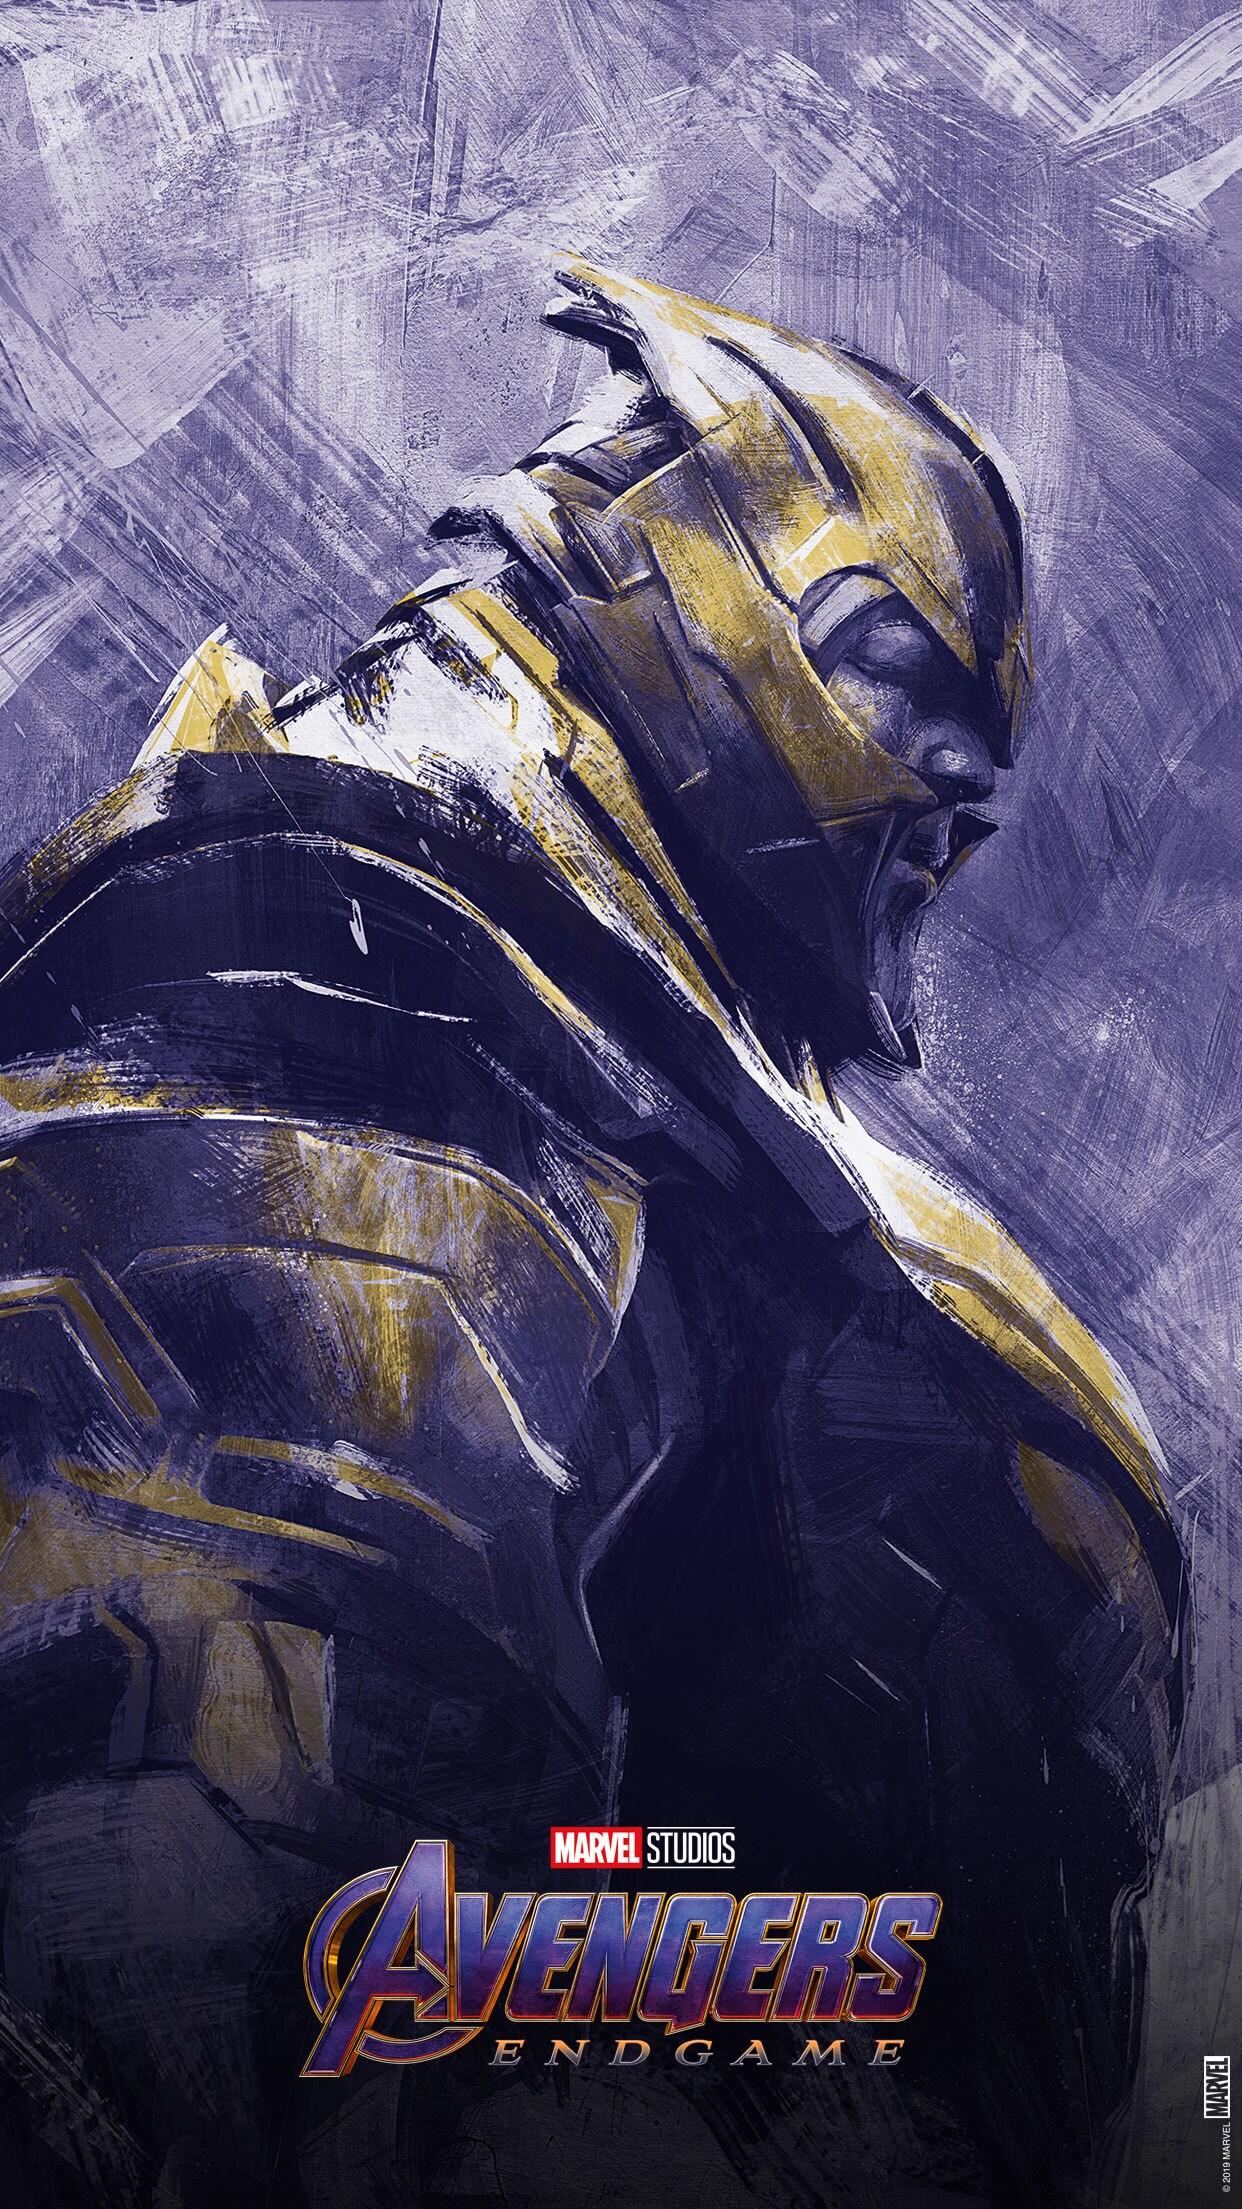 Avengers: Endgame - Mobile Wallpapers | Disney Philippines